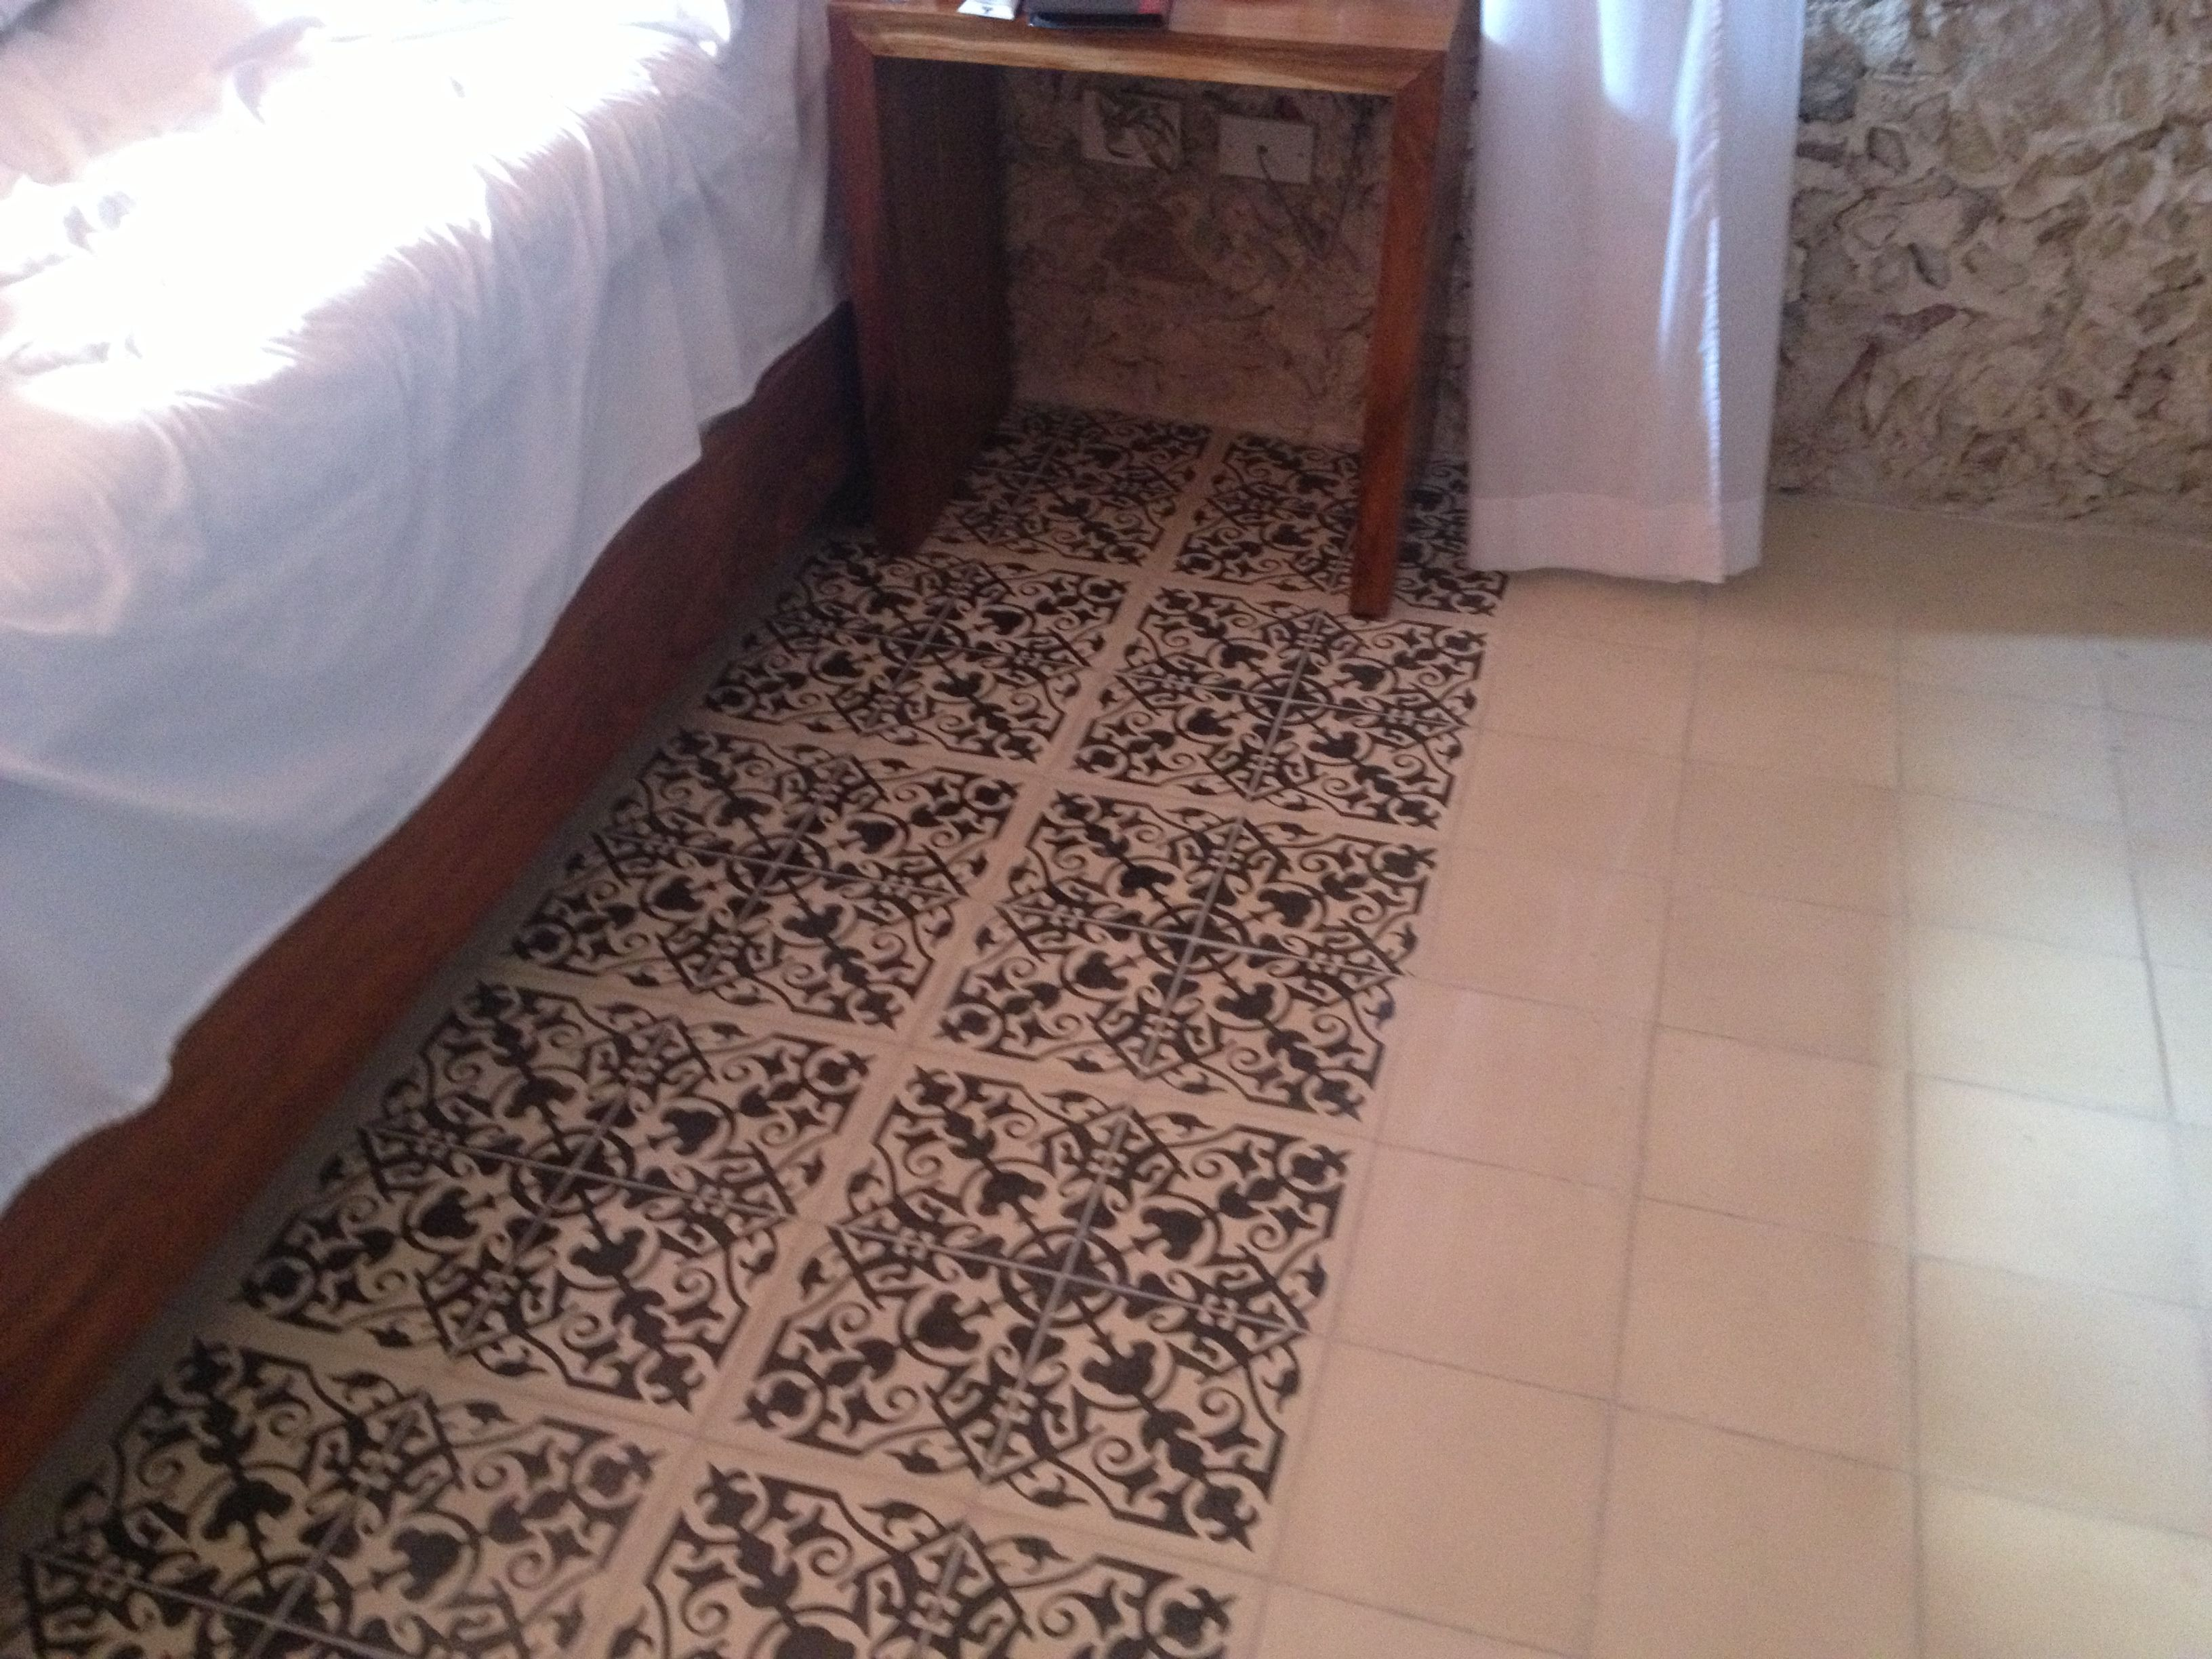 Shot of room floor I took, pasta tiles, at Casa de las Palomas, Mérida Yucatán.